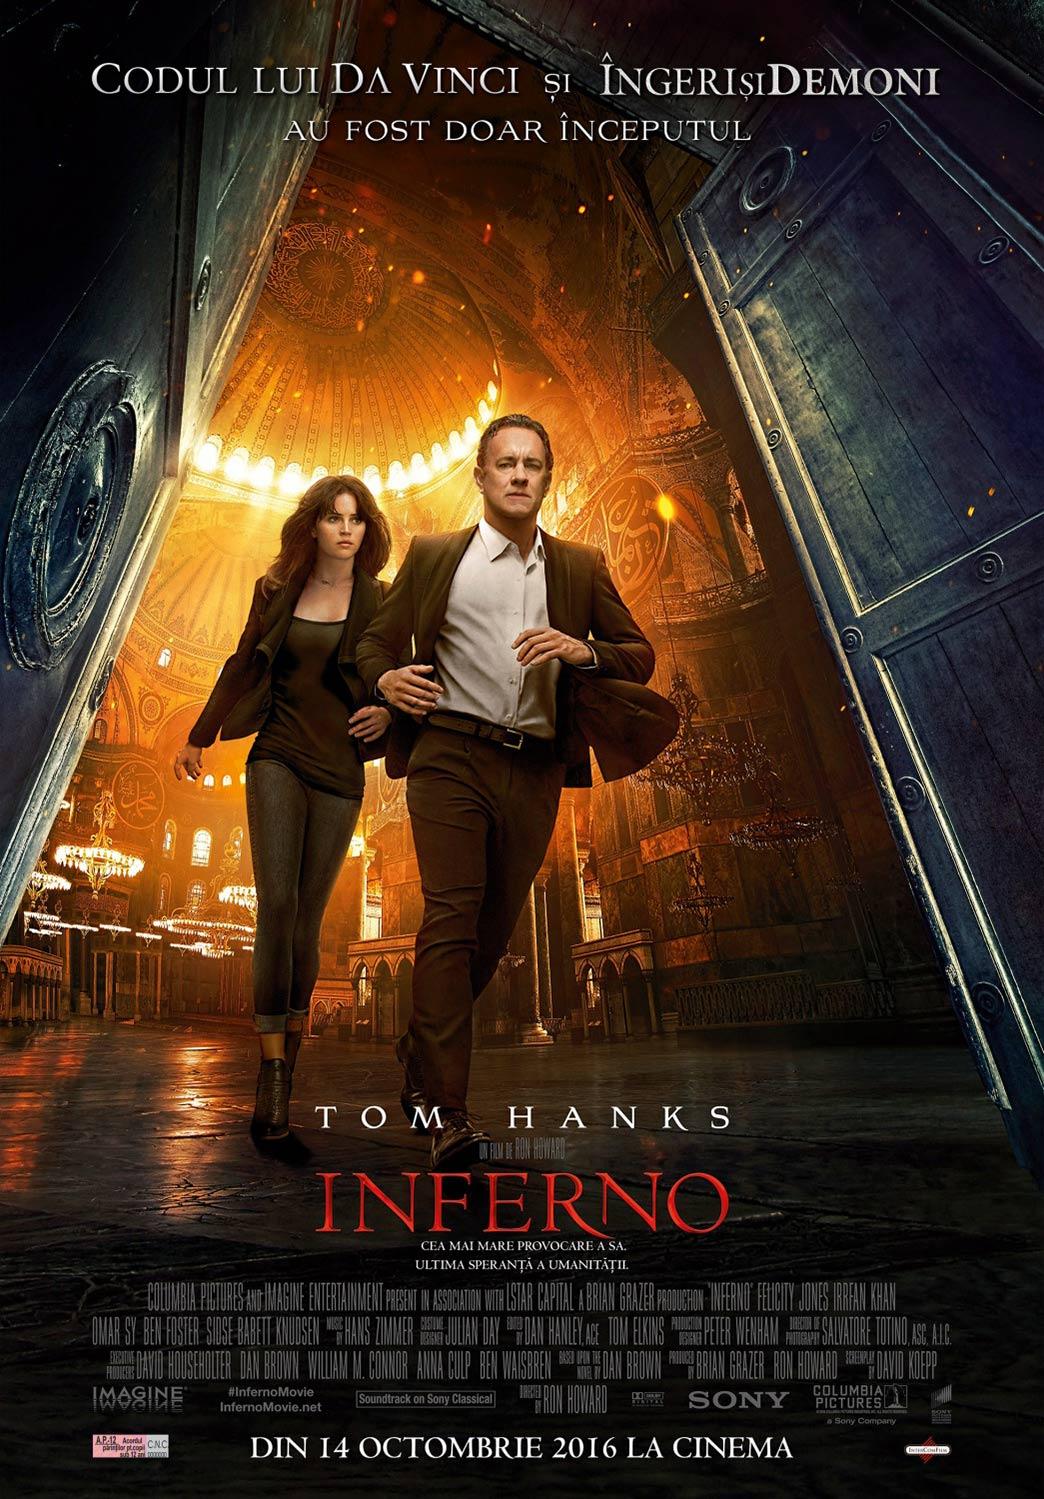 Inferno (2016) Bluray Subtitle Indonesia